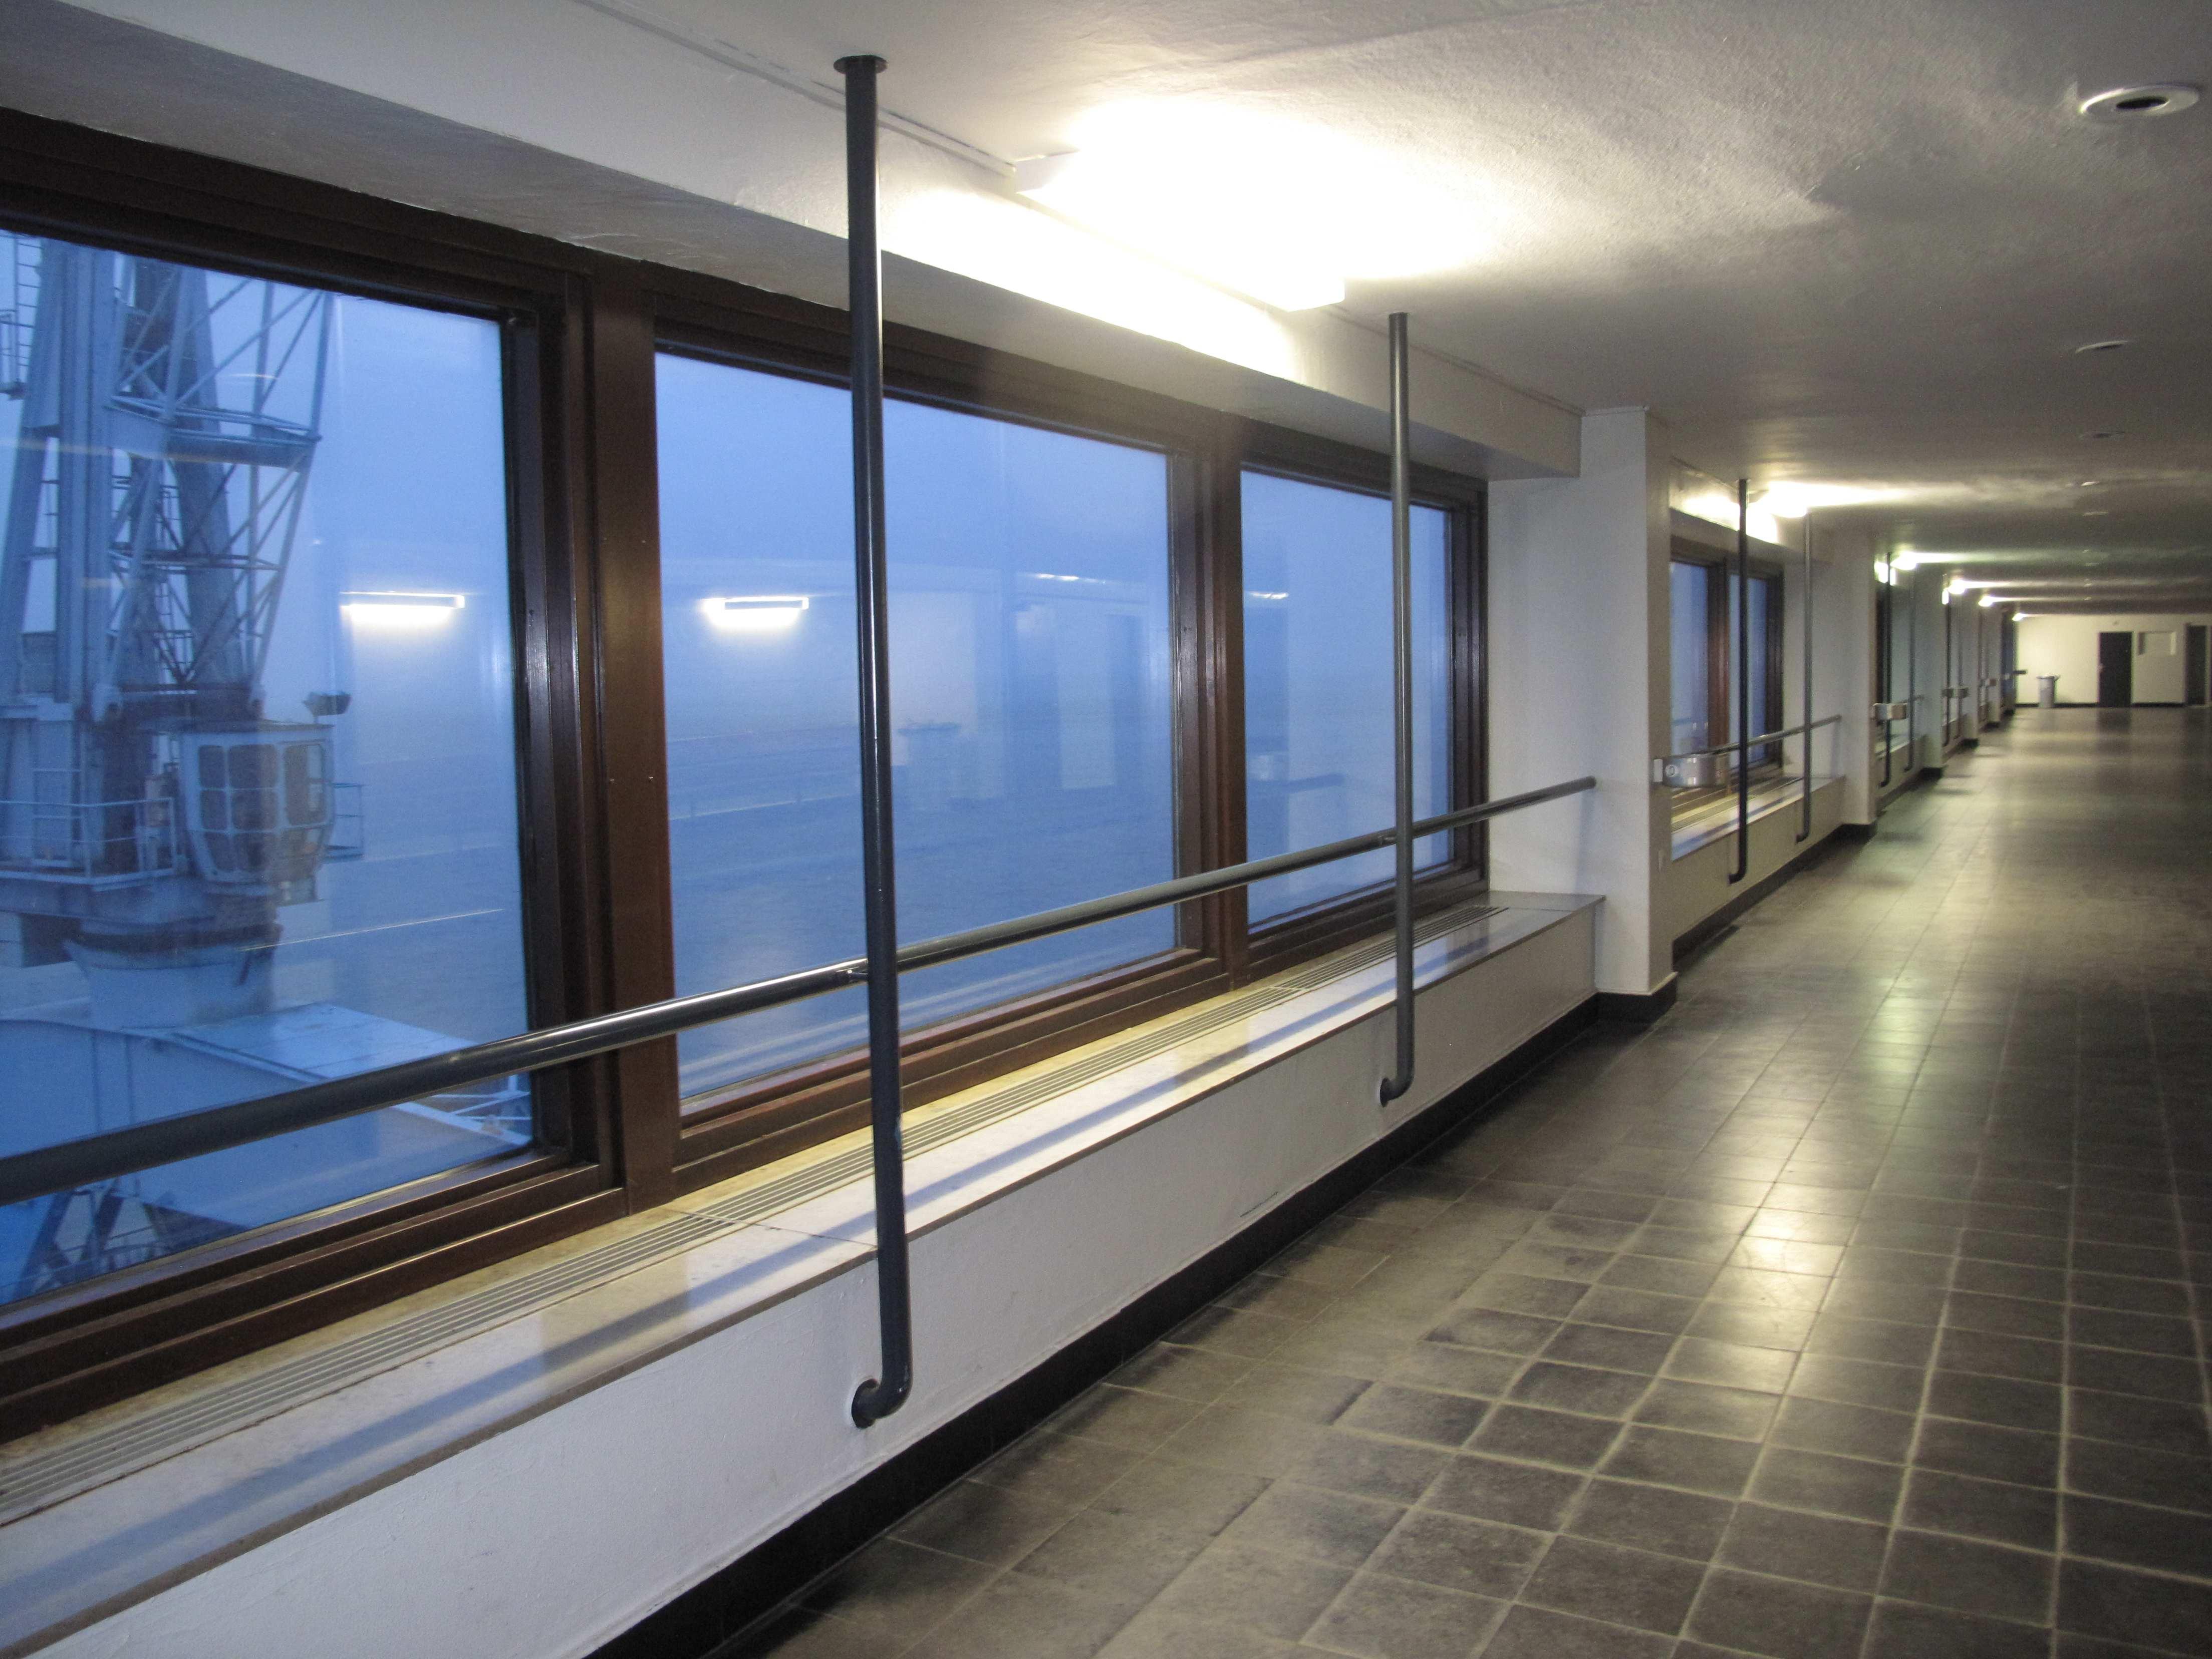 Besuchergalerie Bremerhaven